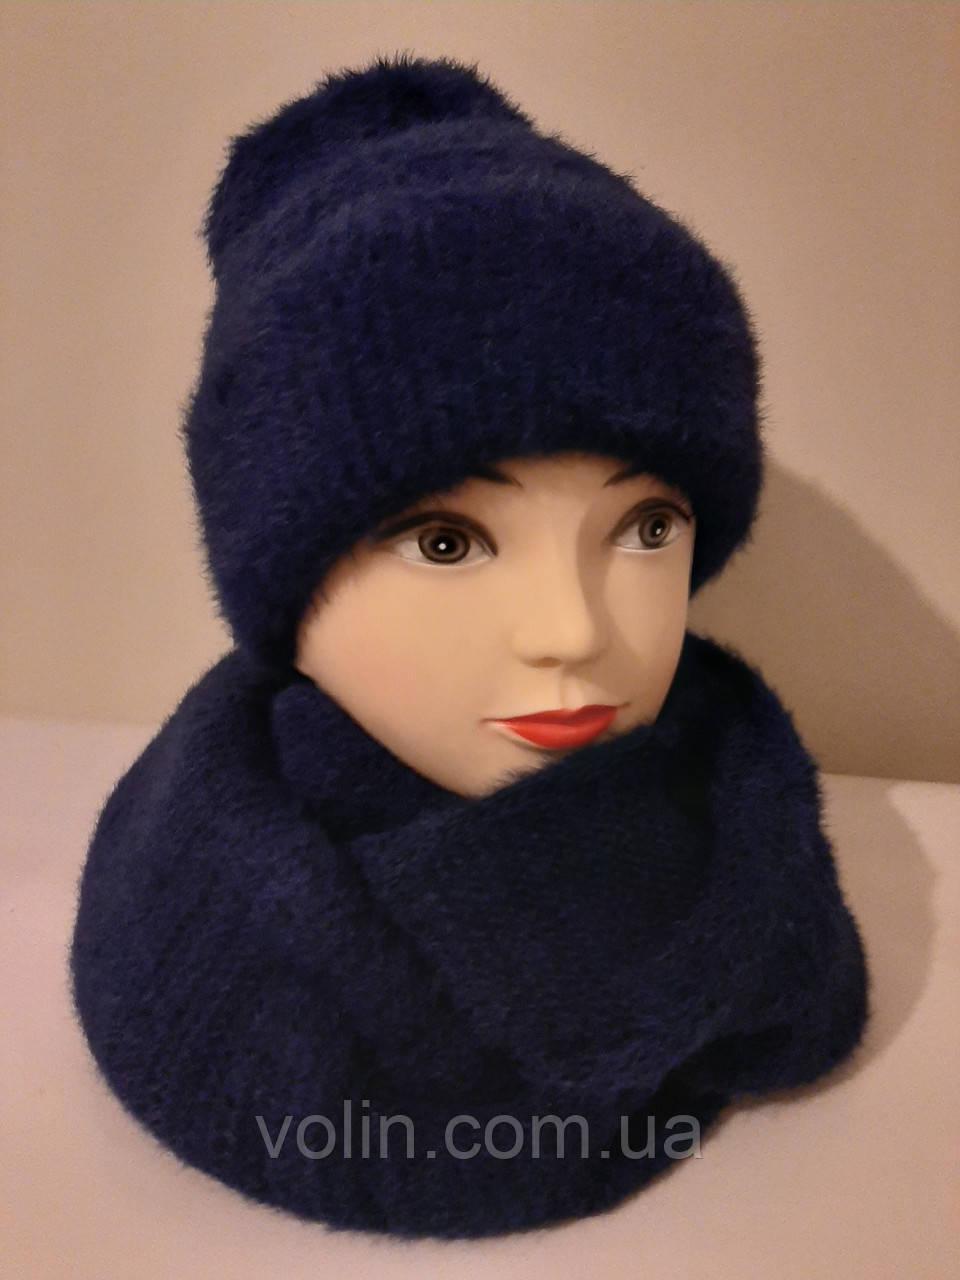 Женские комплекты шапка и хомут с ангорой.